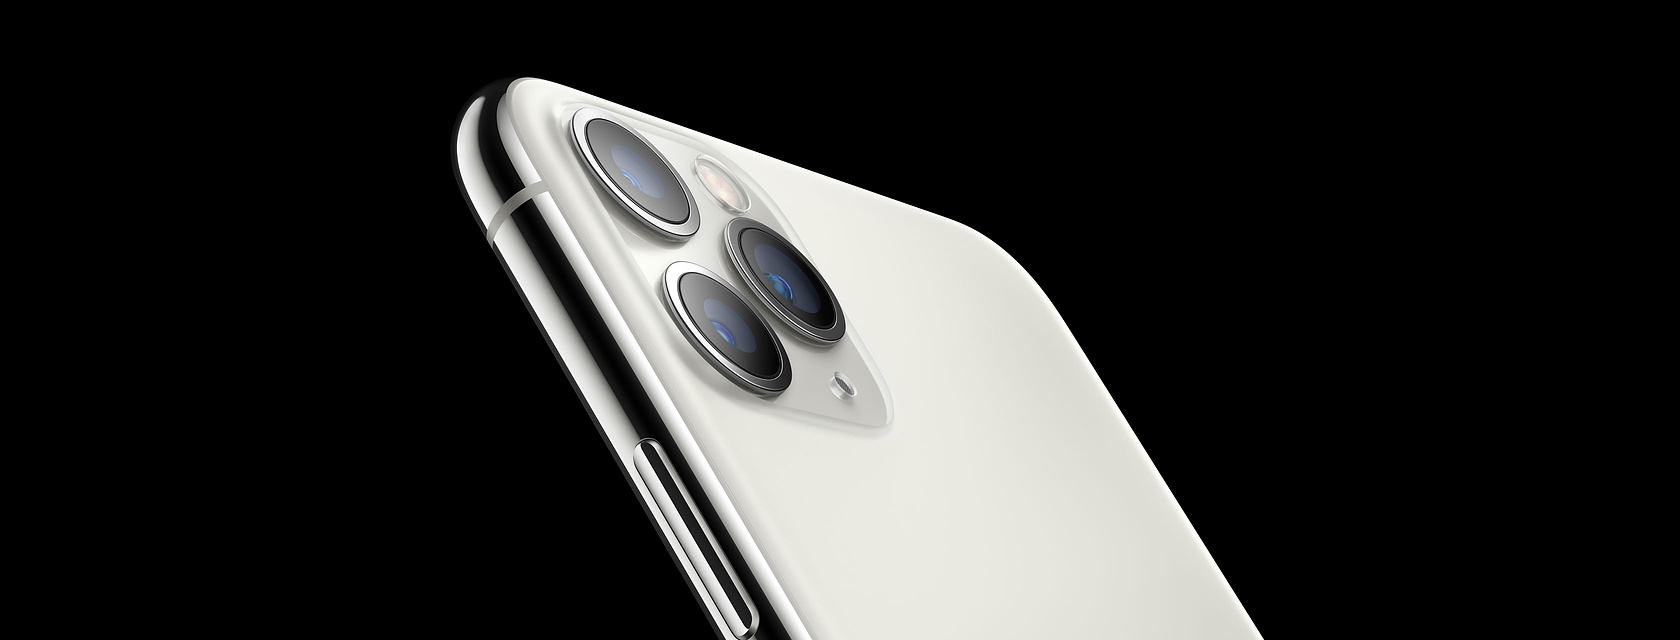 айфон 11 про макс 256 серебристый